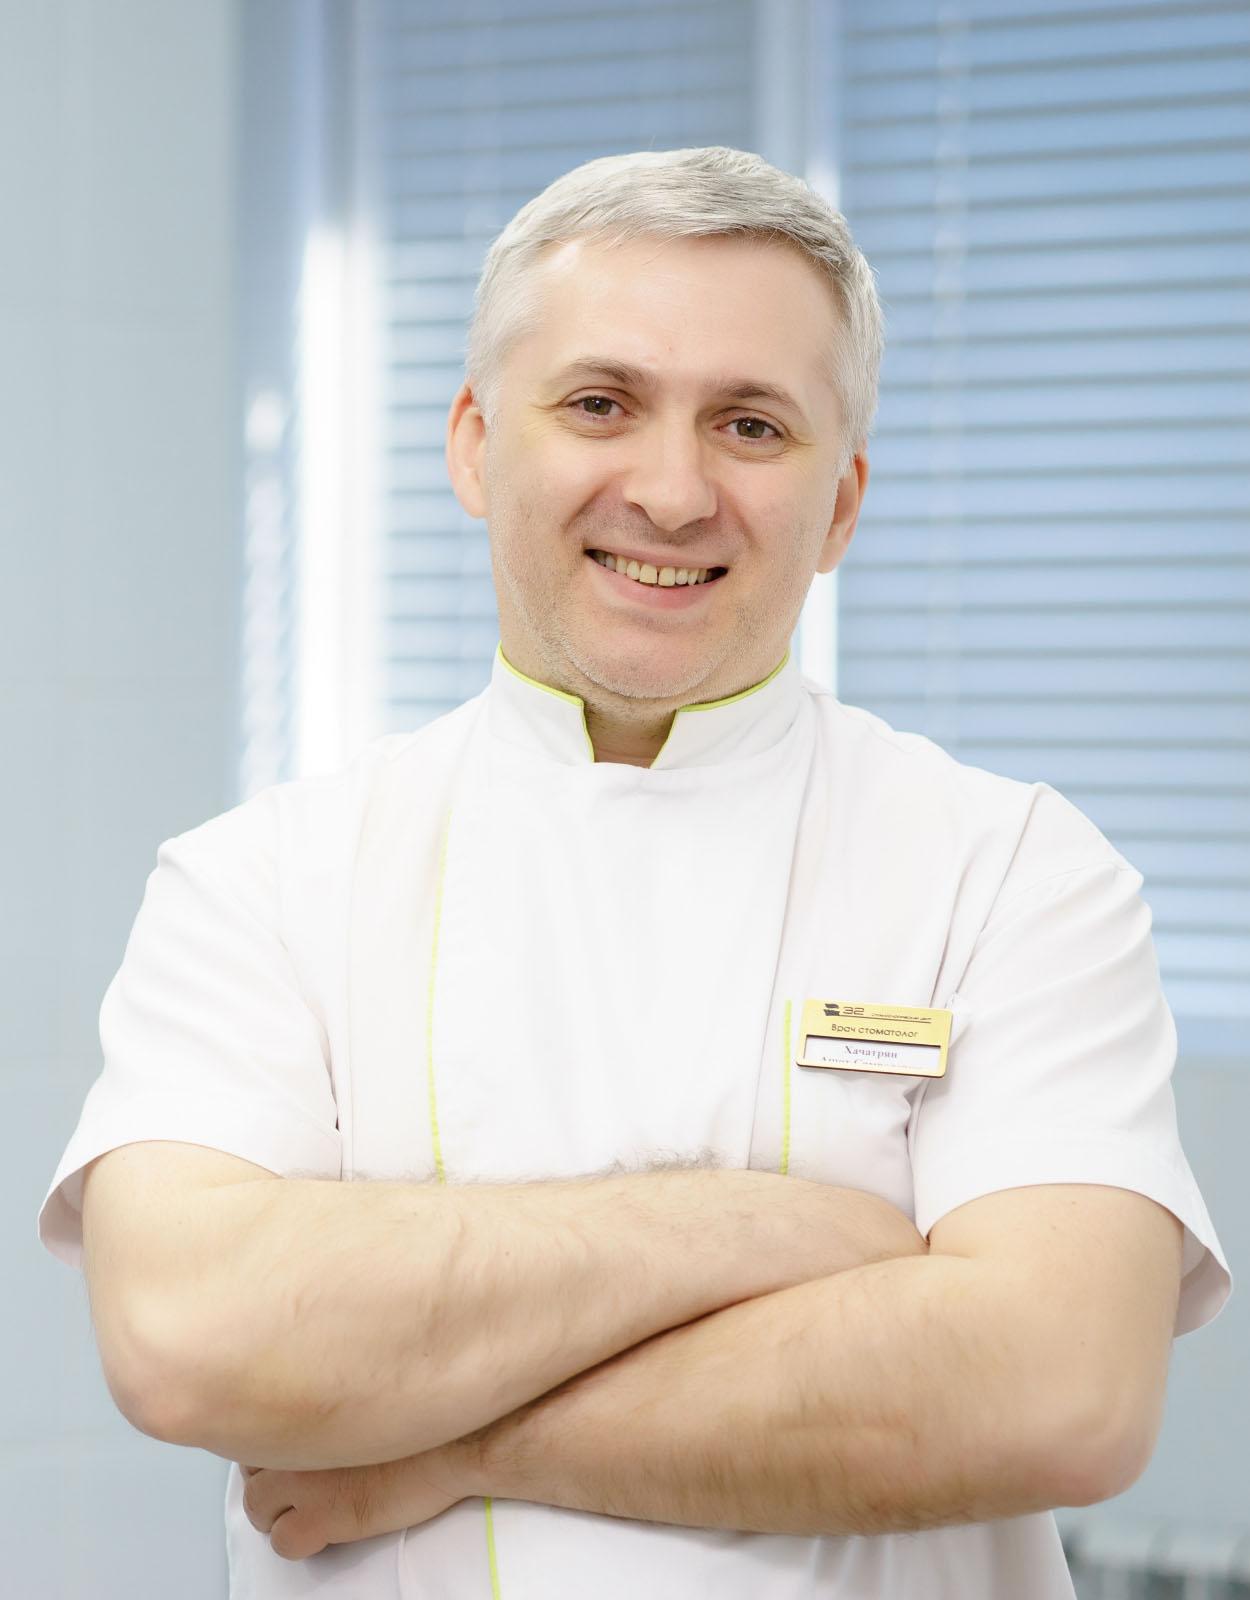 Хачатрян Ашот Самвелович : Врач-стоматолог-хирург,кандидат медицинских наук - стаж более 17 лет